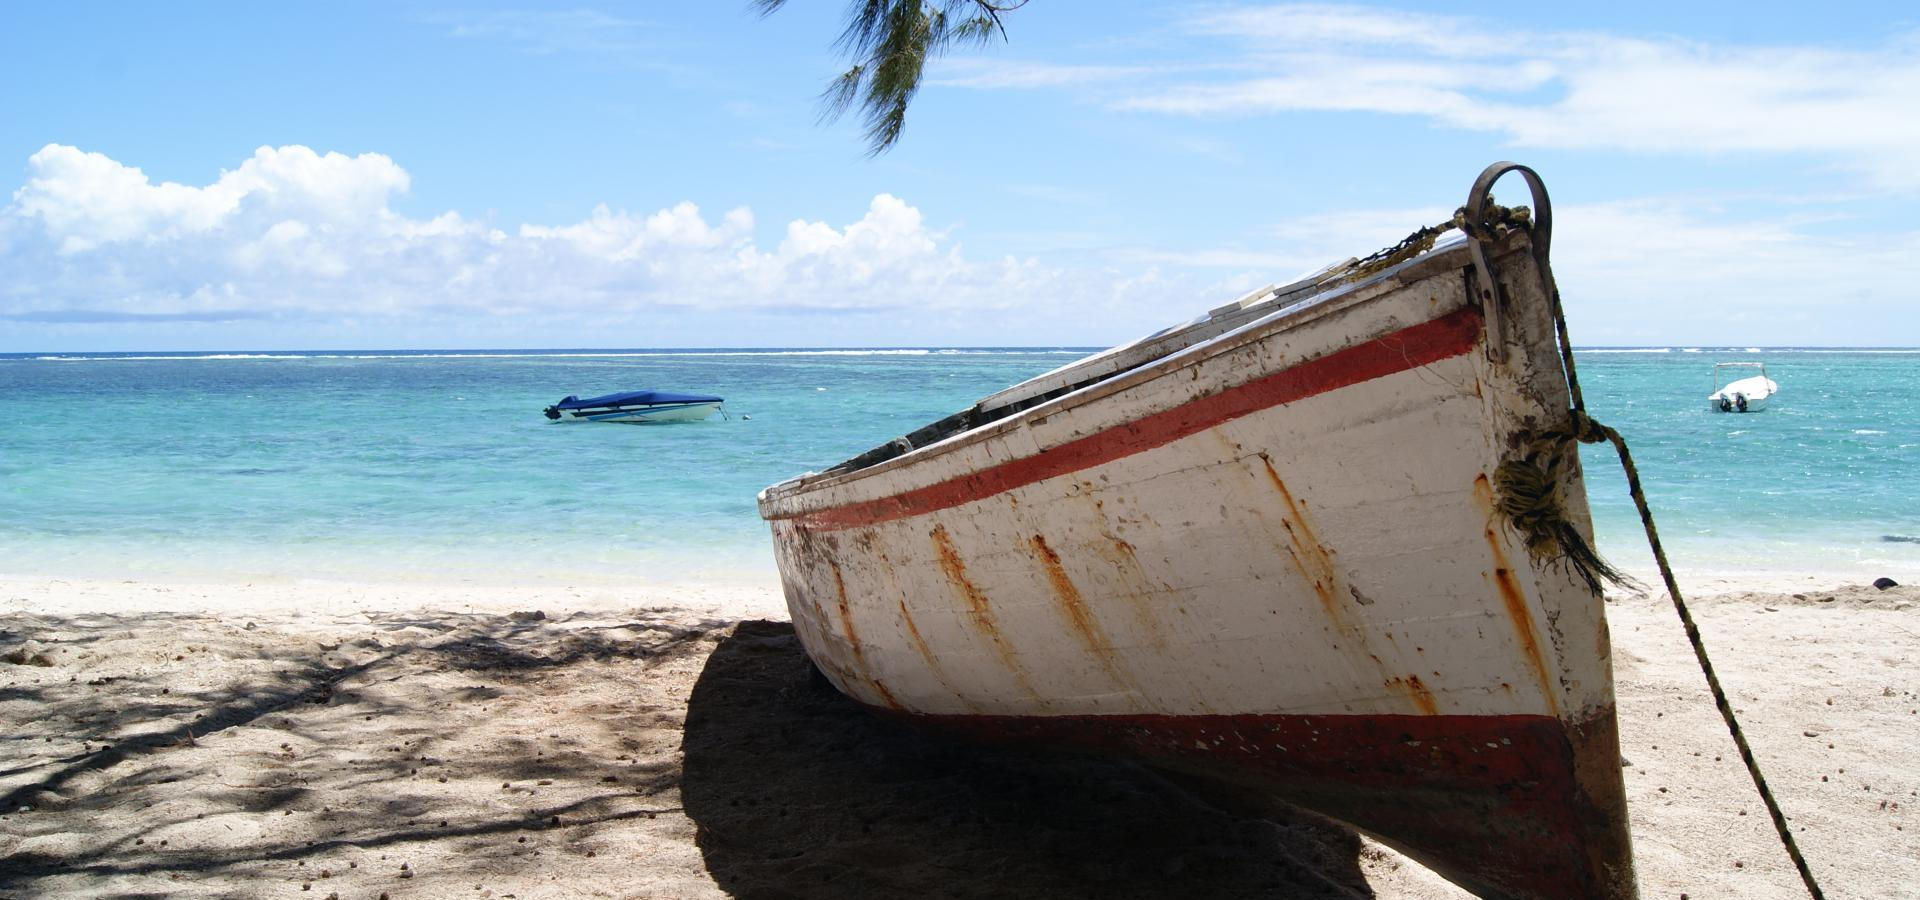 Boot am Strand - Mauritius Urlaub & Reisen